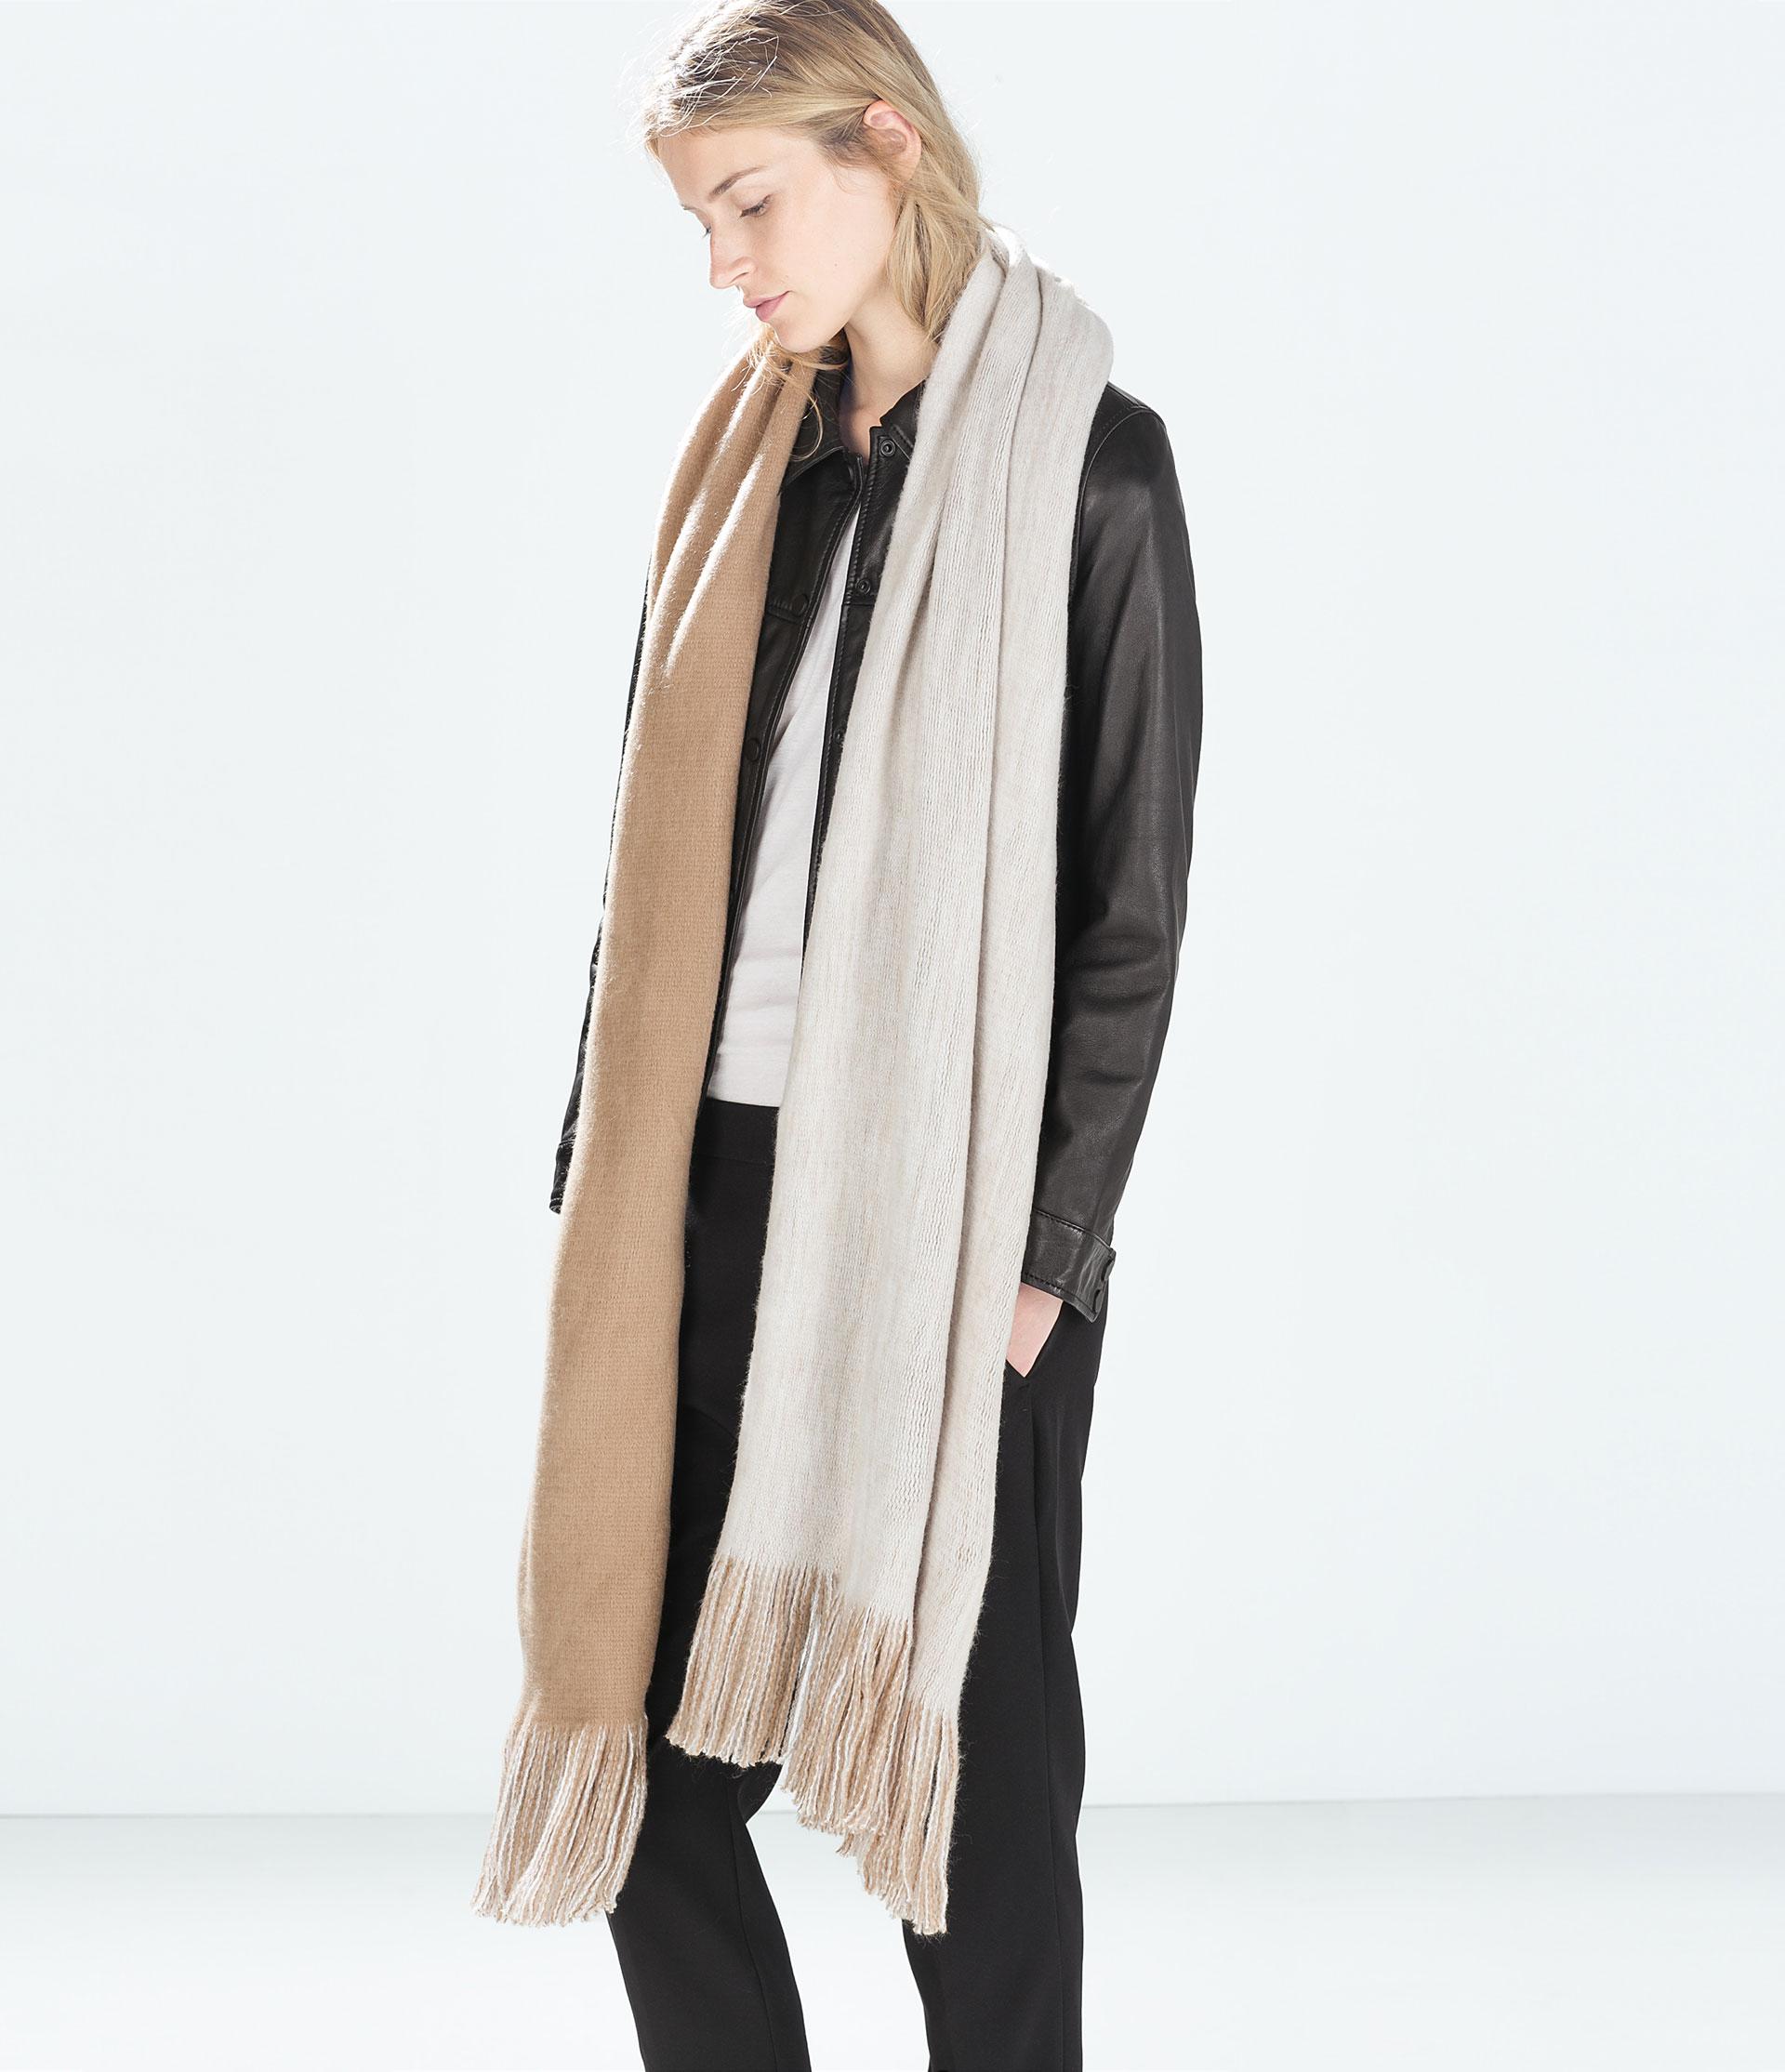 zara soft layered scarf in lyst